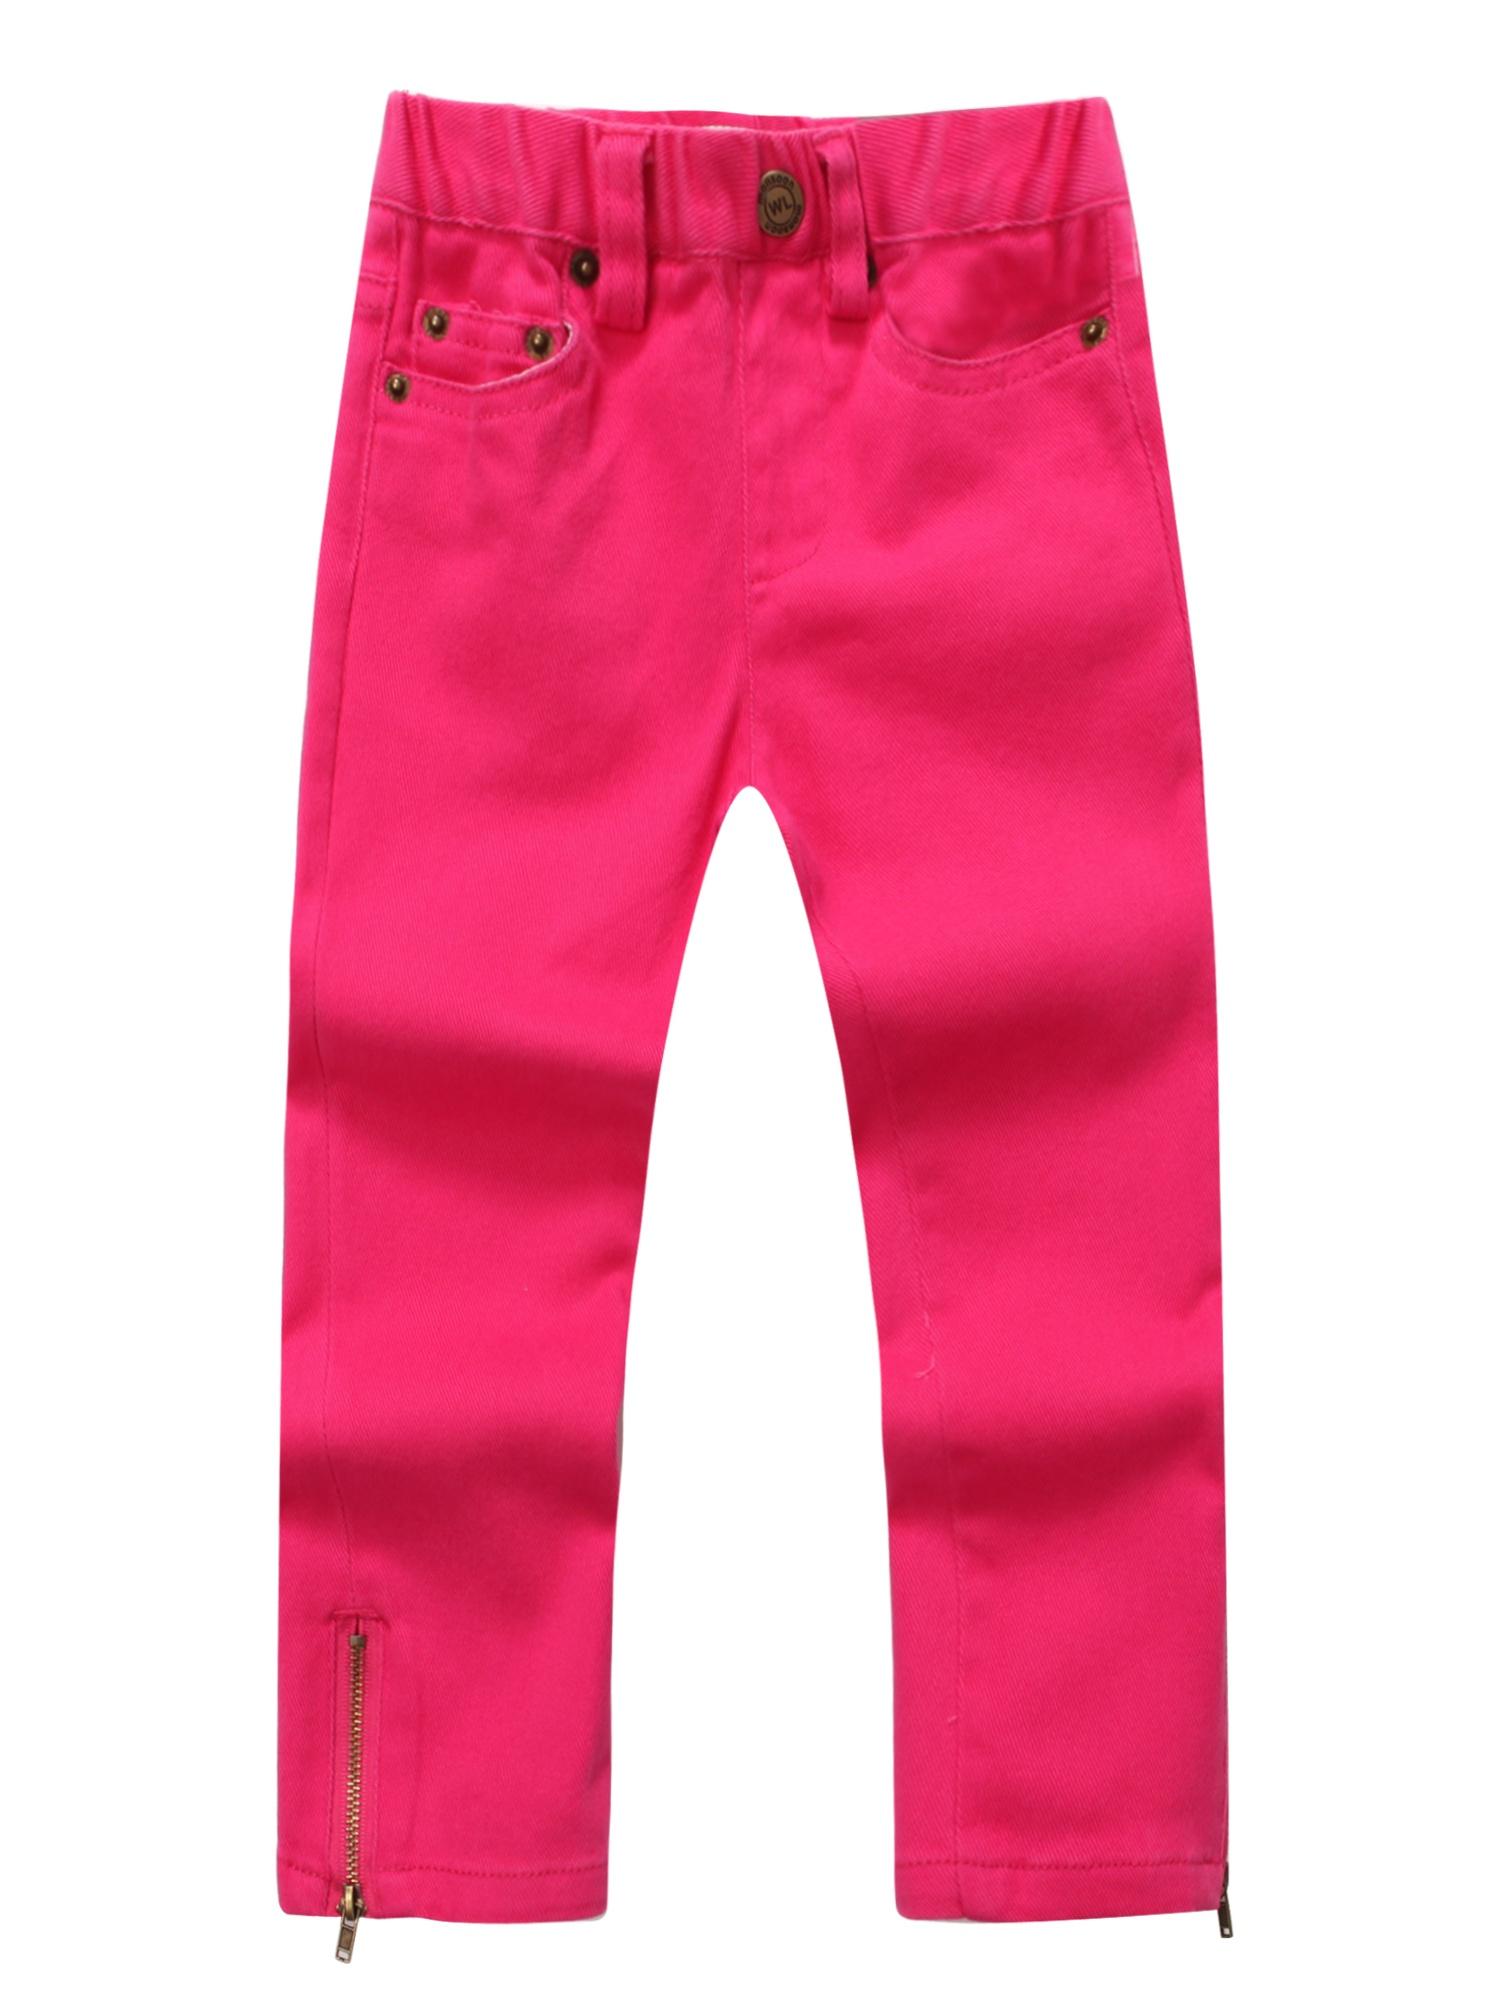 Richie House Girls' Denim Pants RH0772